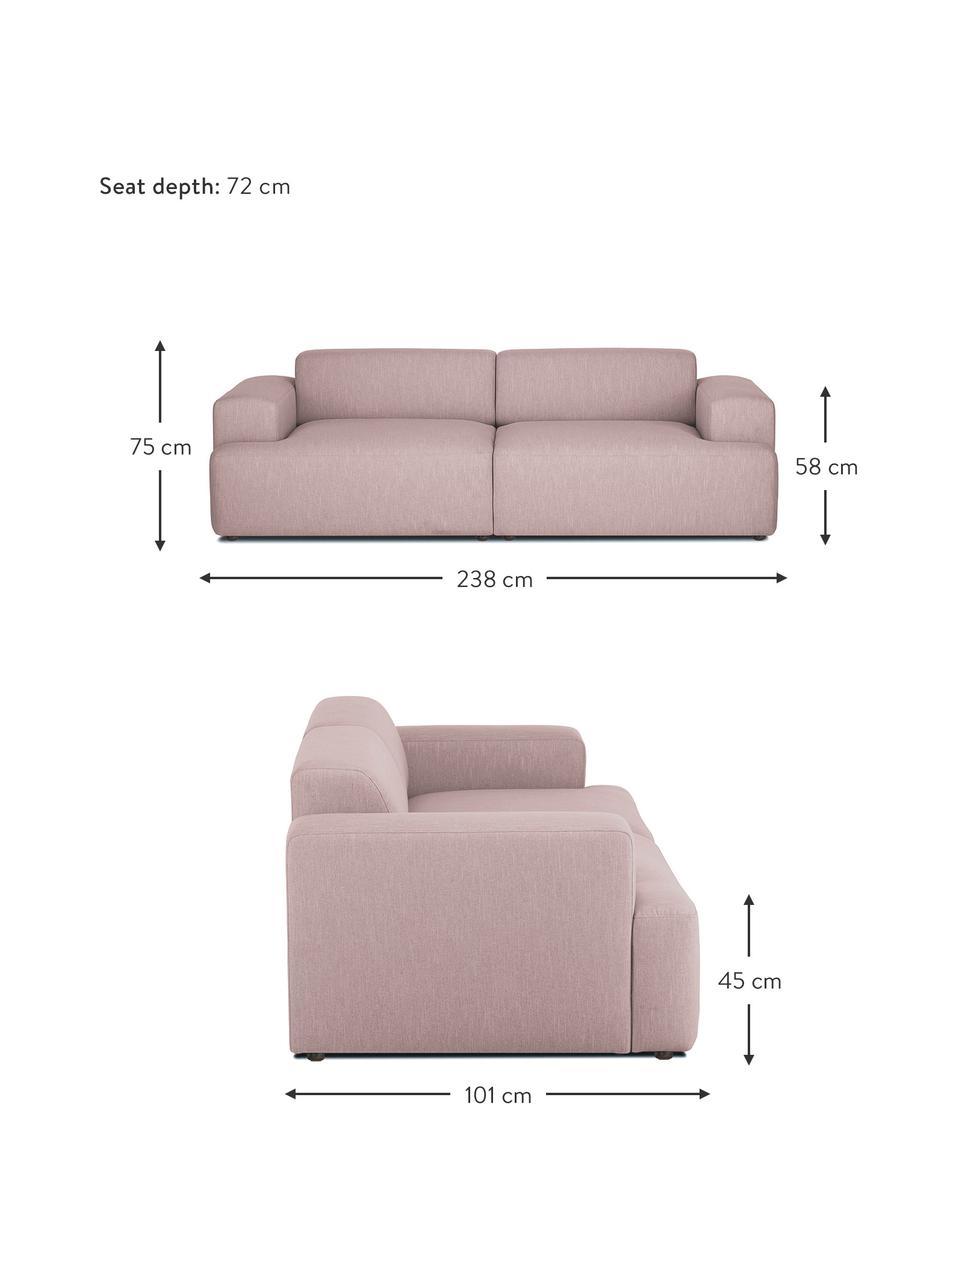 Bank Melva (3-zits) in roze, Bekleding: 100% polyester, Frame: massief grenenhout, FSC-g, Poten: kunststof, Geweven stof roze, 238 x 101 cm